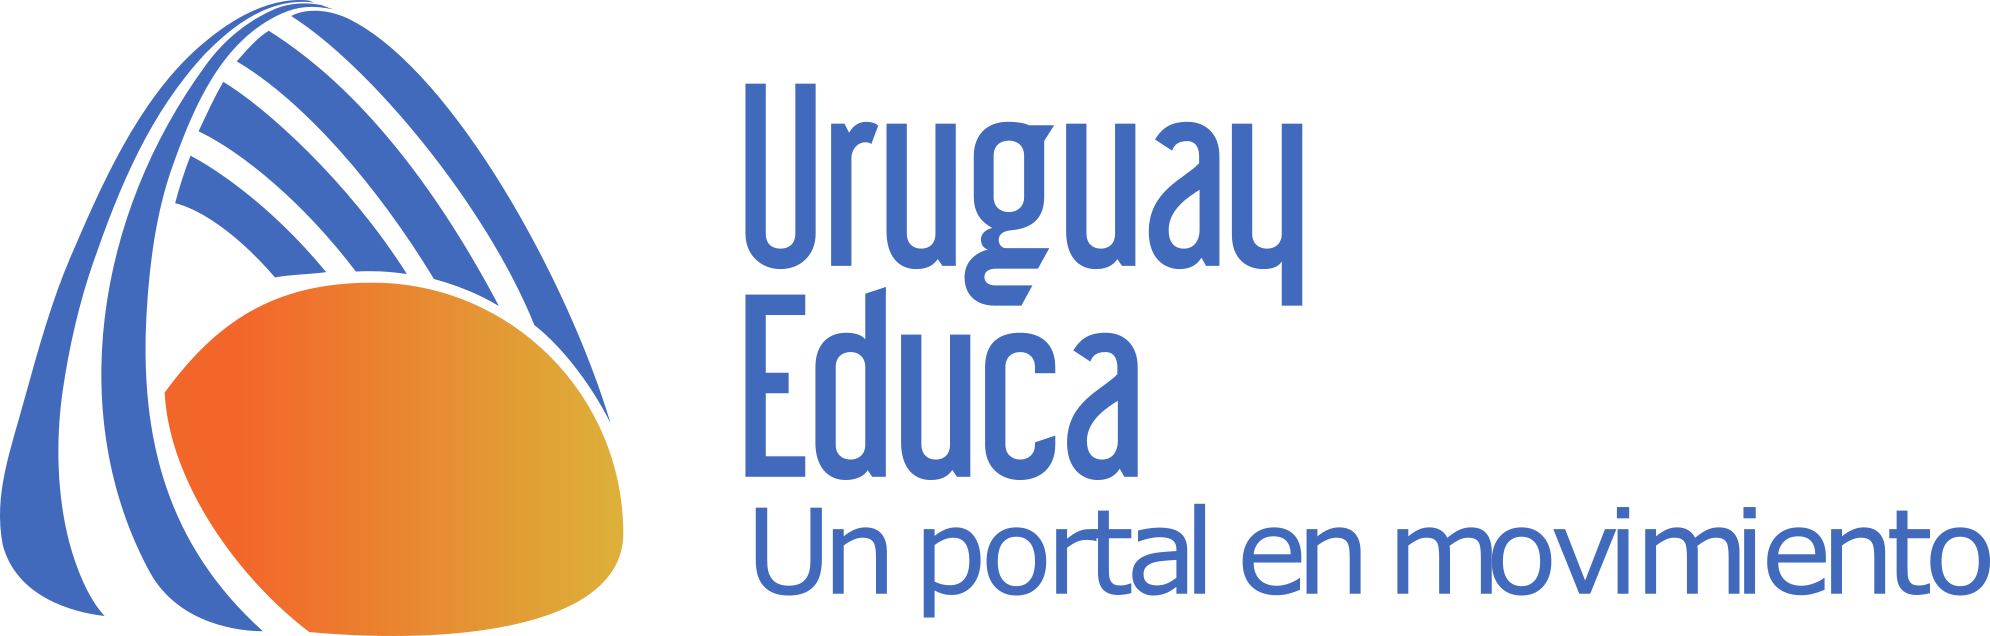 logo de Portal Uruguay Educa